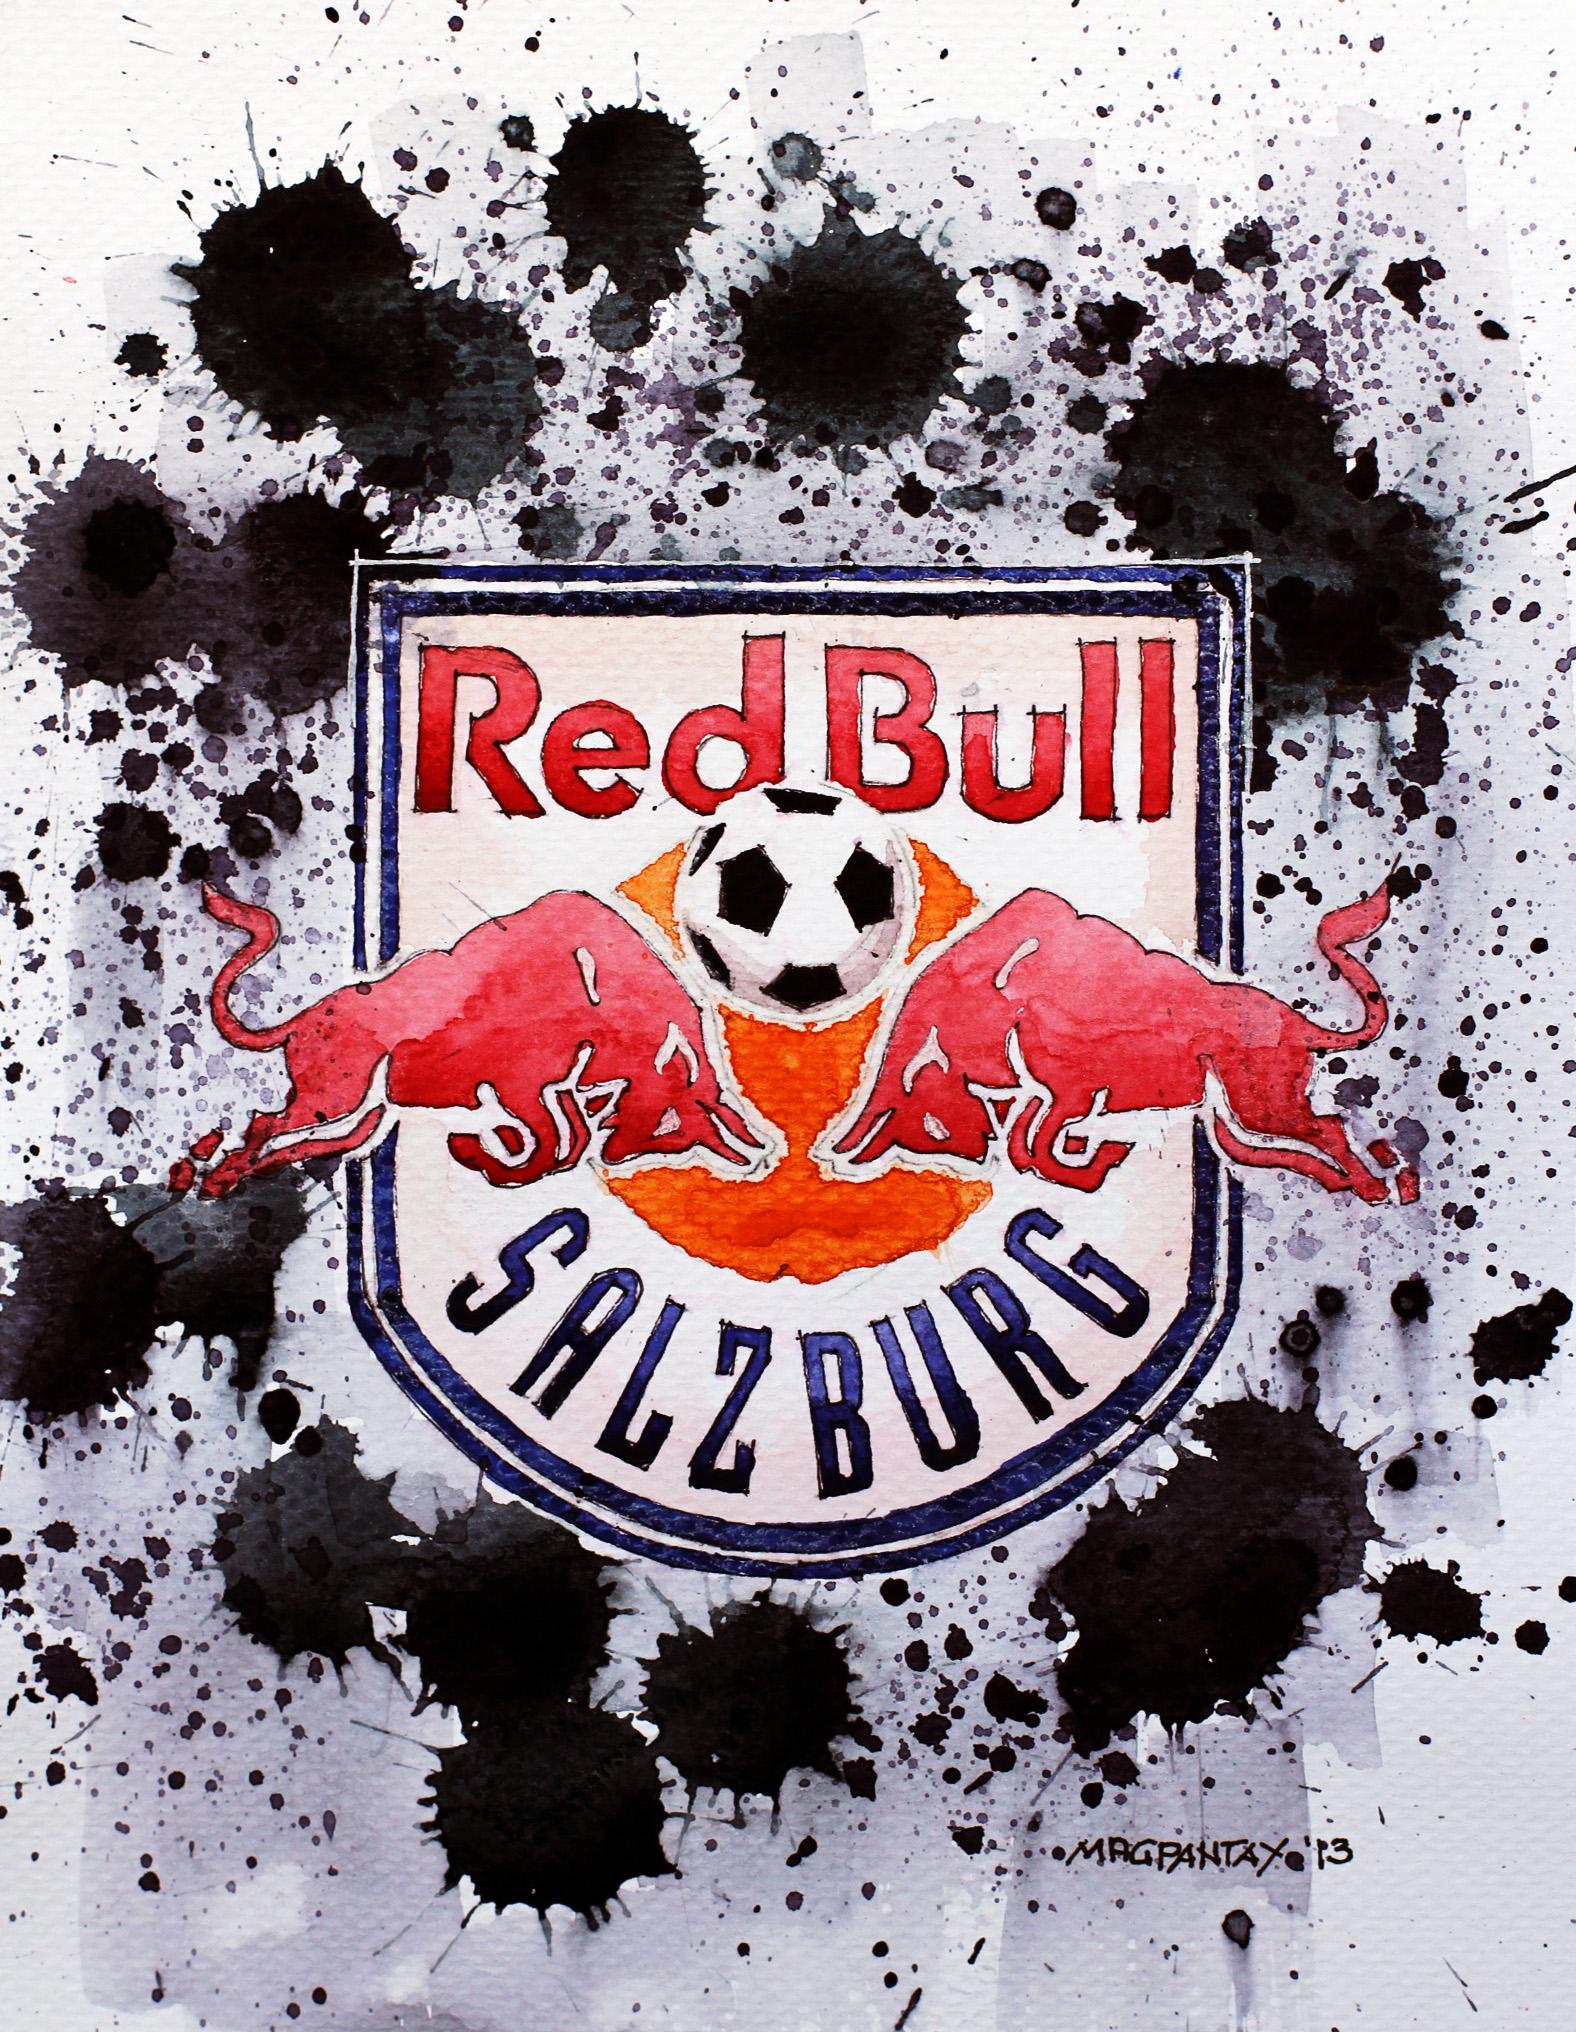 bull-salzburg-logo-wappen.jpg?x35400?x35